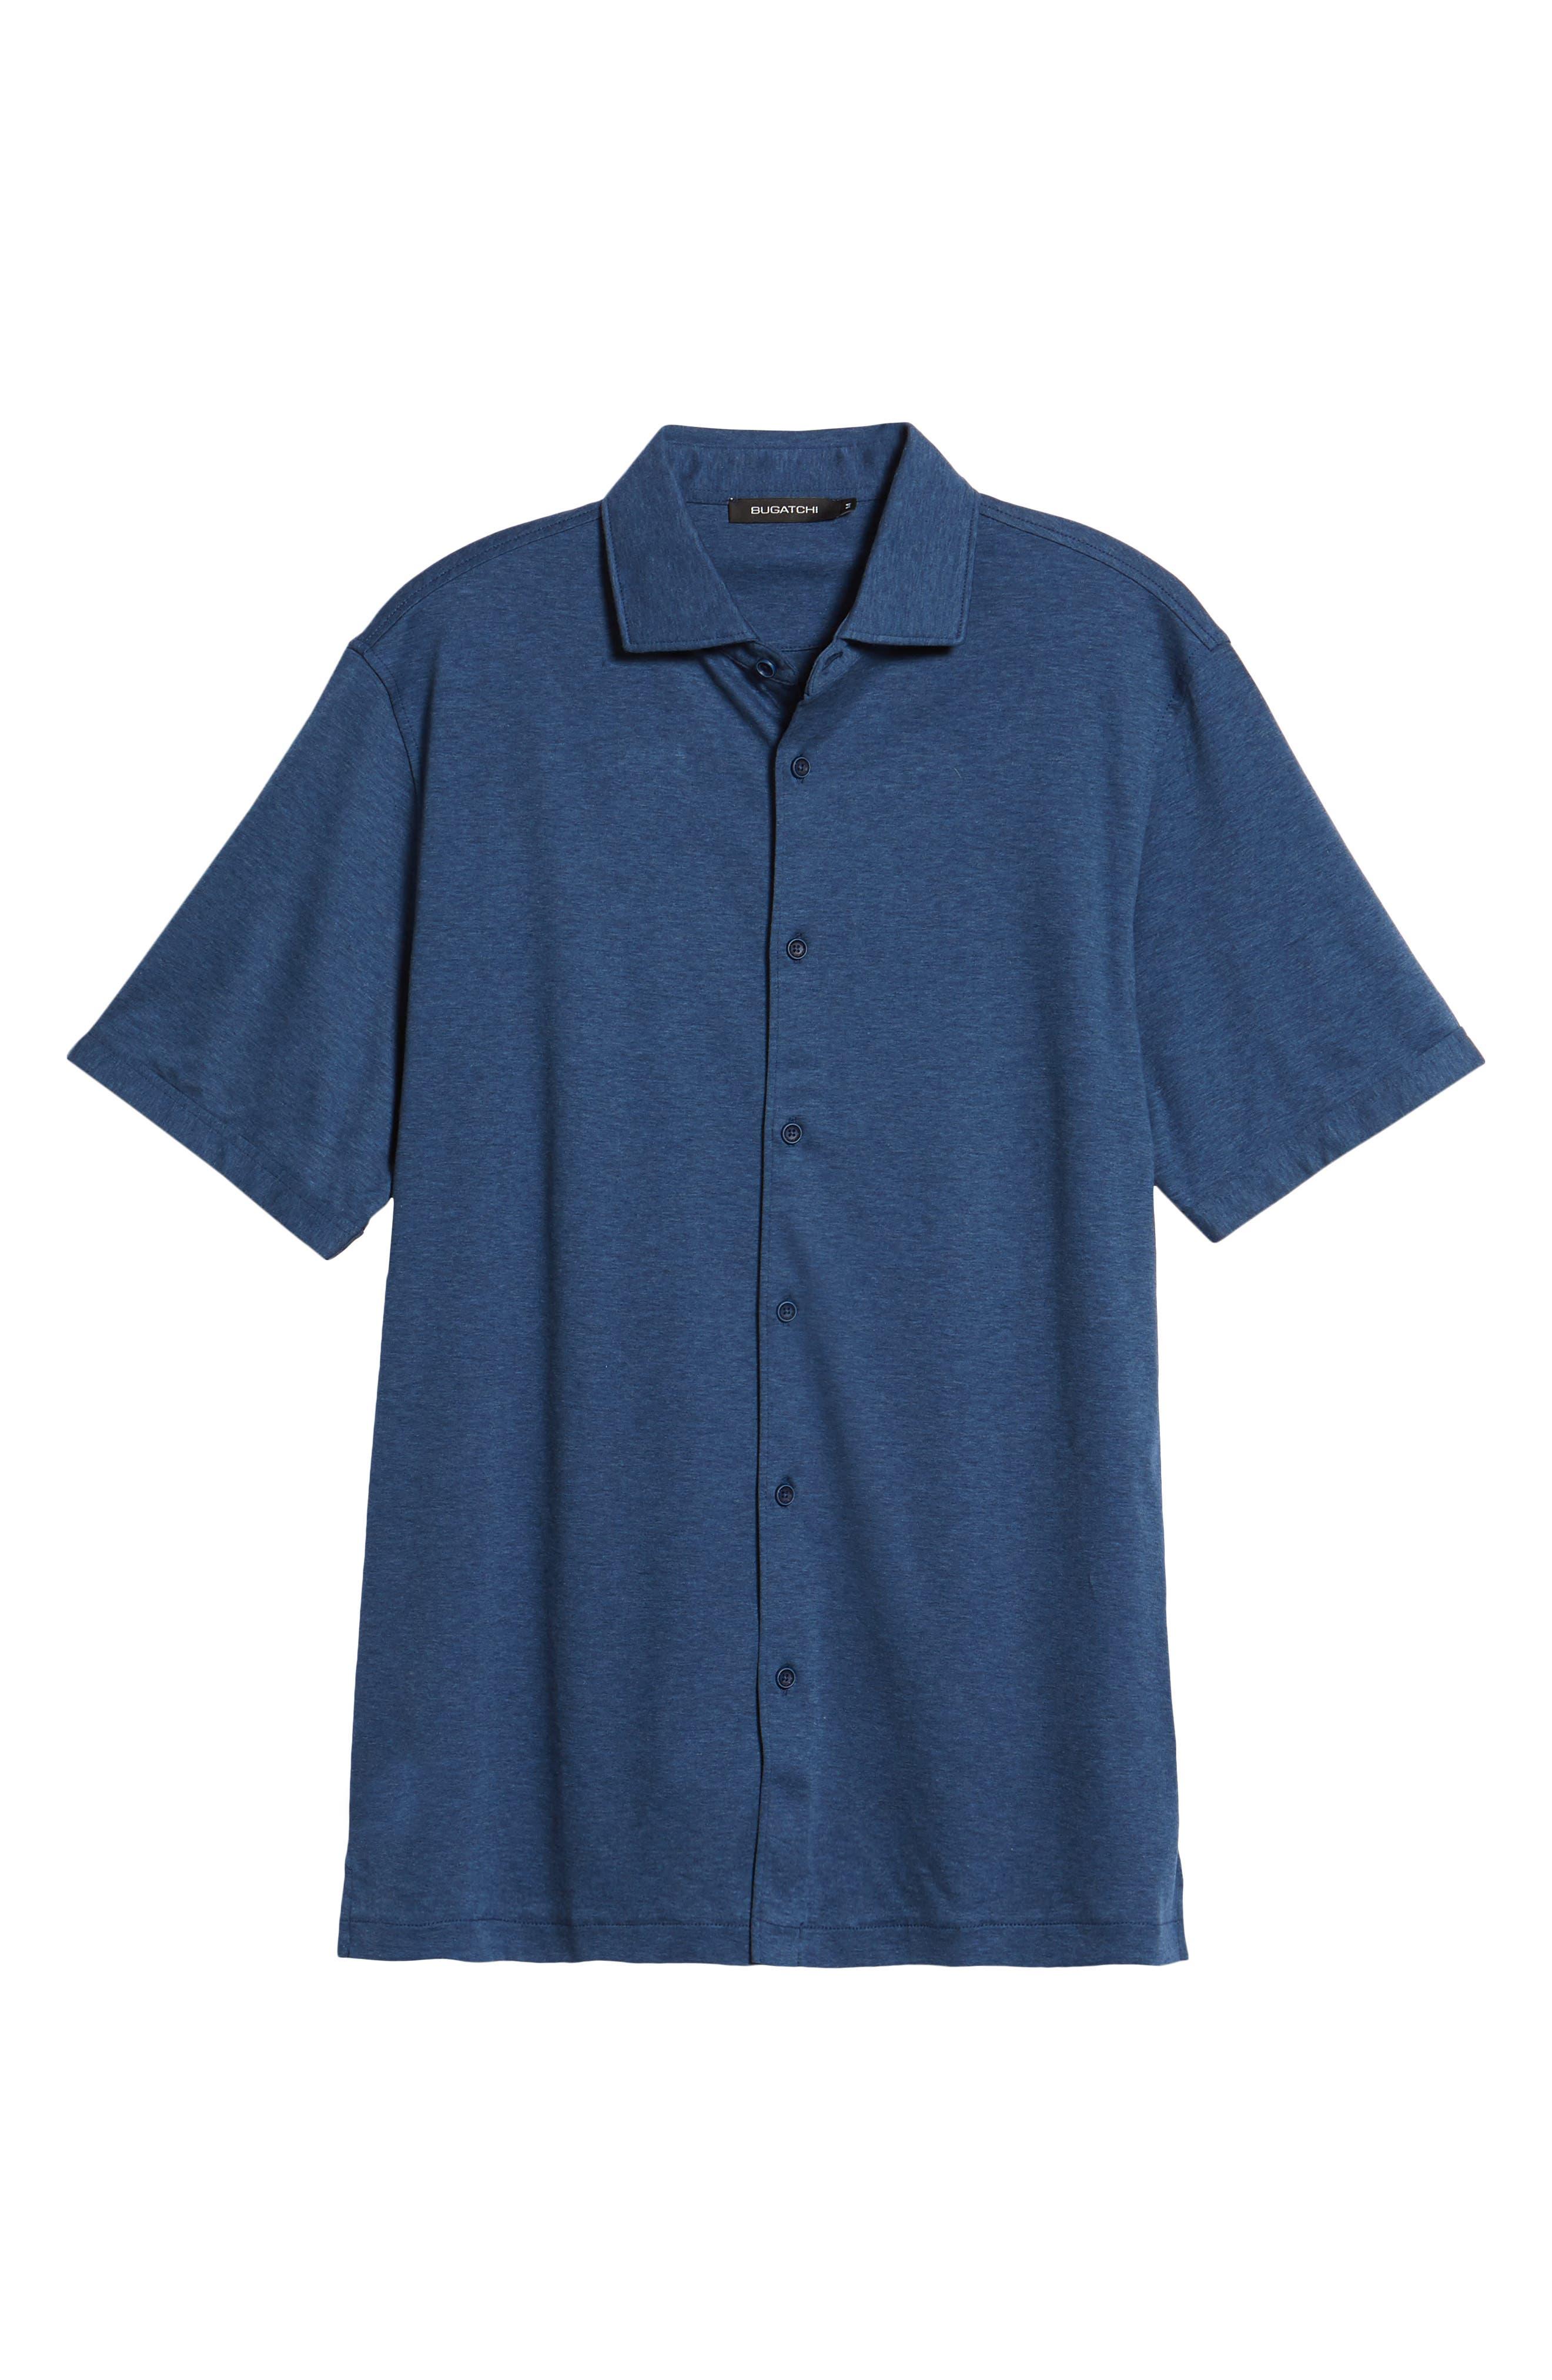 Regular Fit Heather Knit Sport Shirt,                             Alternate thumbnail 6, color,                             NAVY